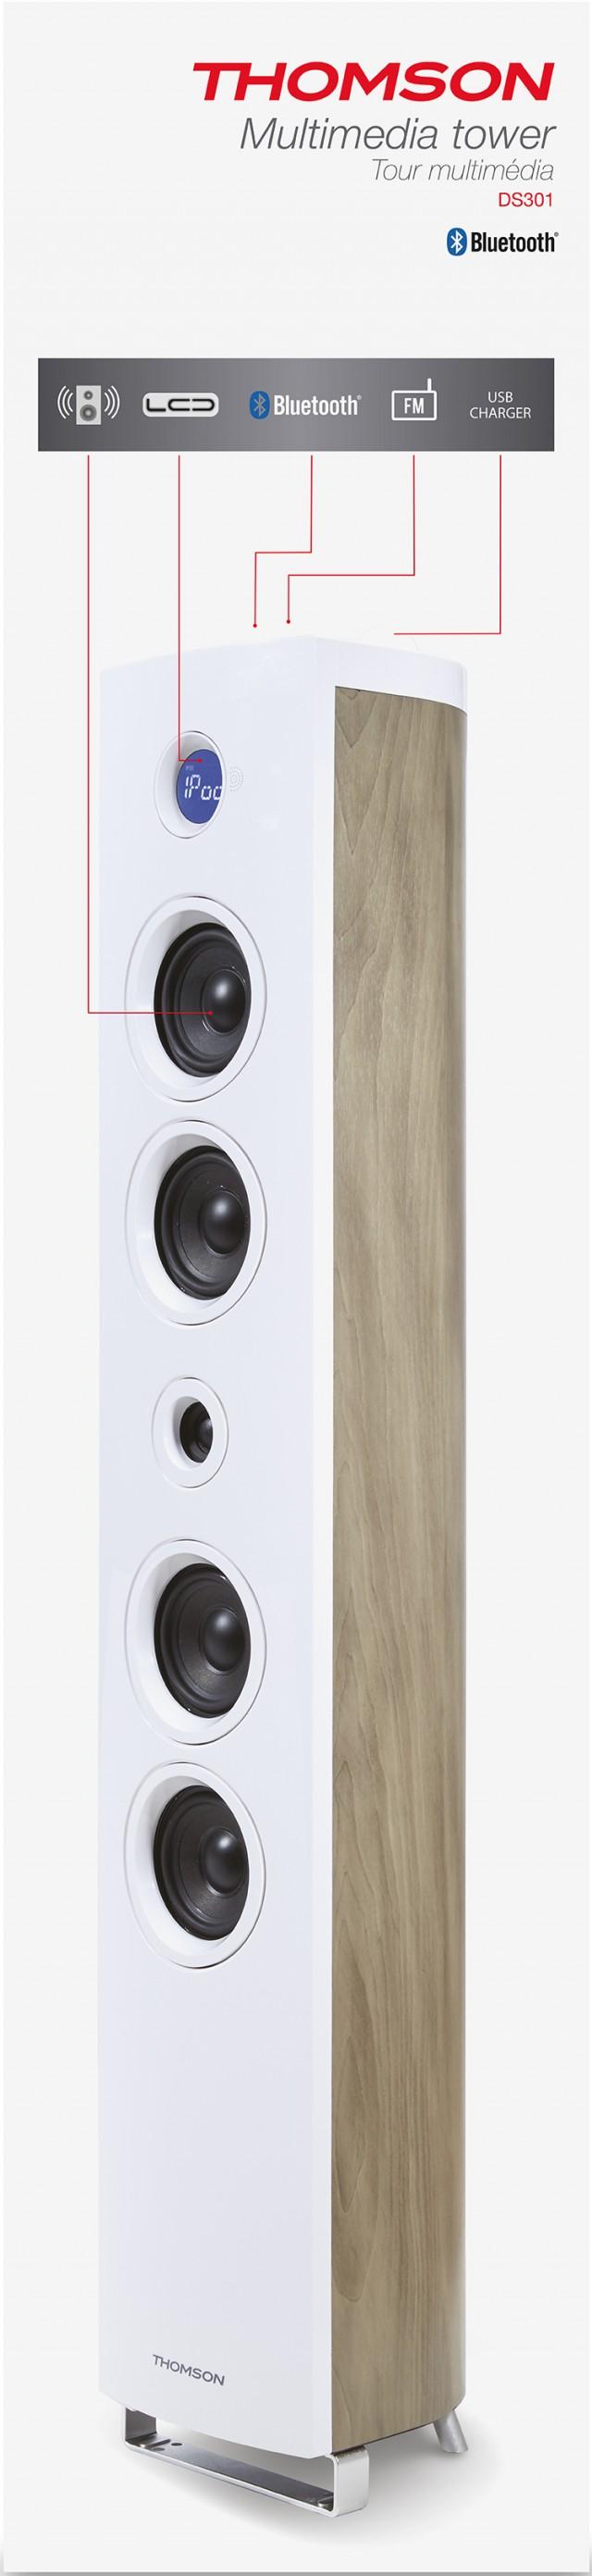 Multimedia Tower 'Wood' (White) – Immagine #2